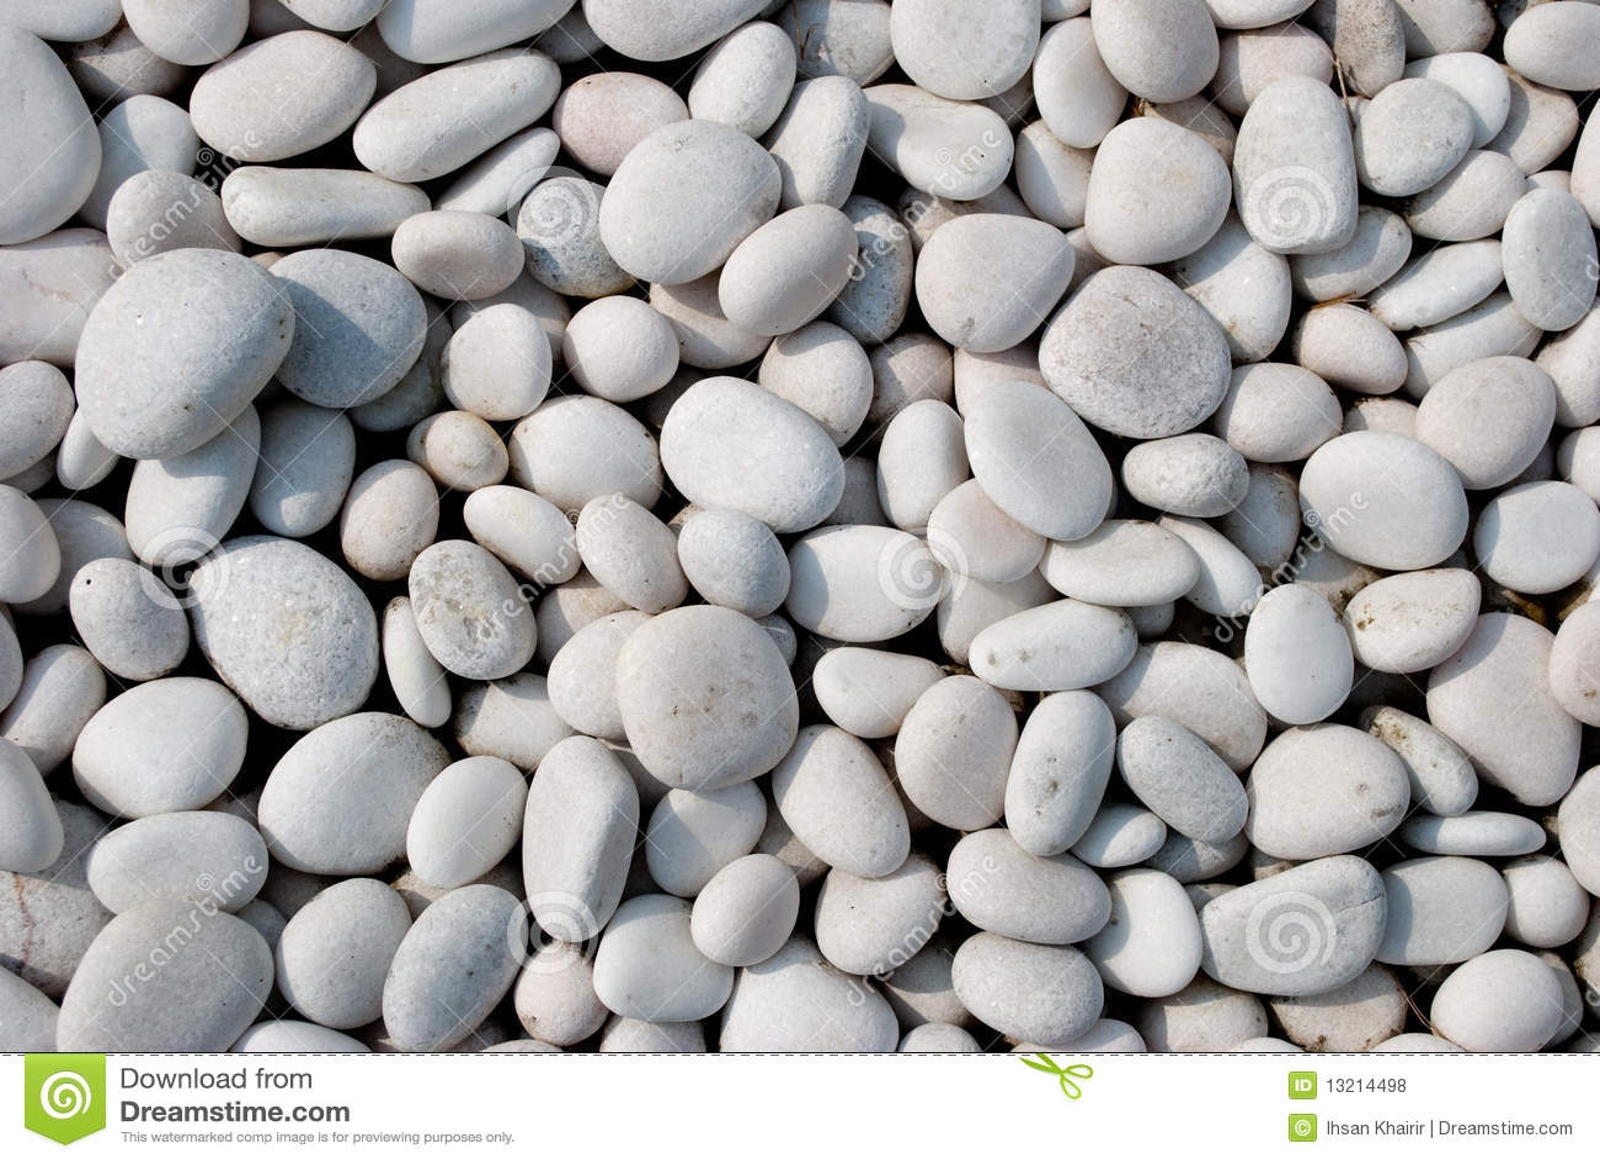 Pebbles Texture Royalty Free Stock Photos Image 13214498